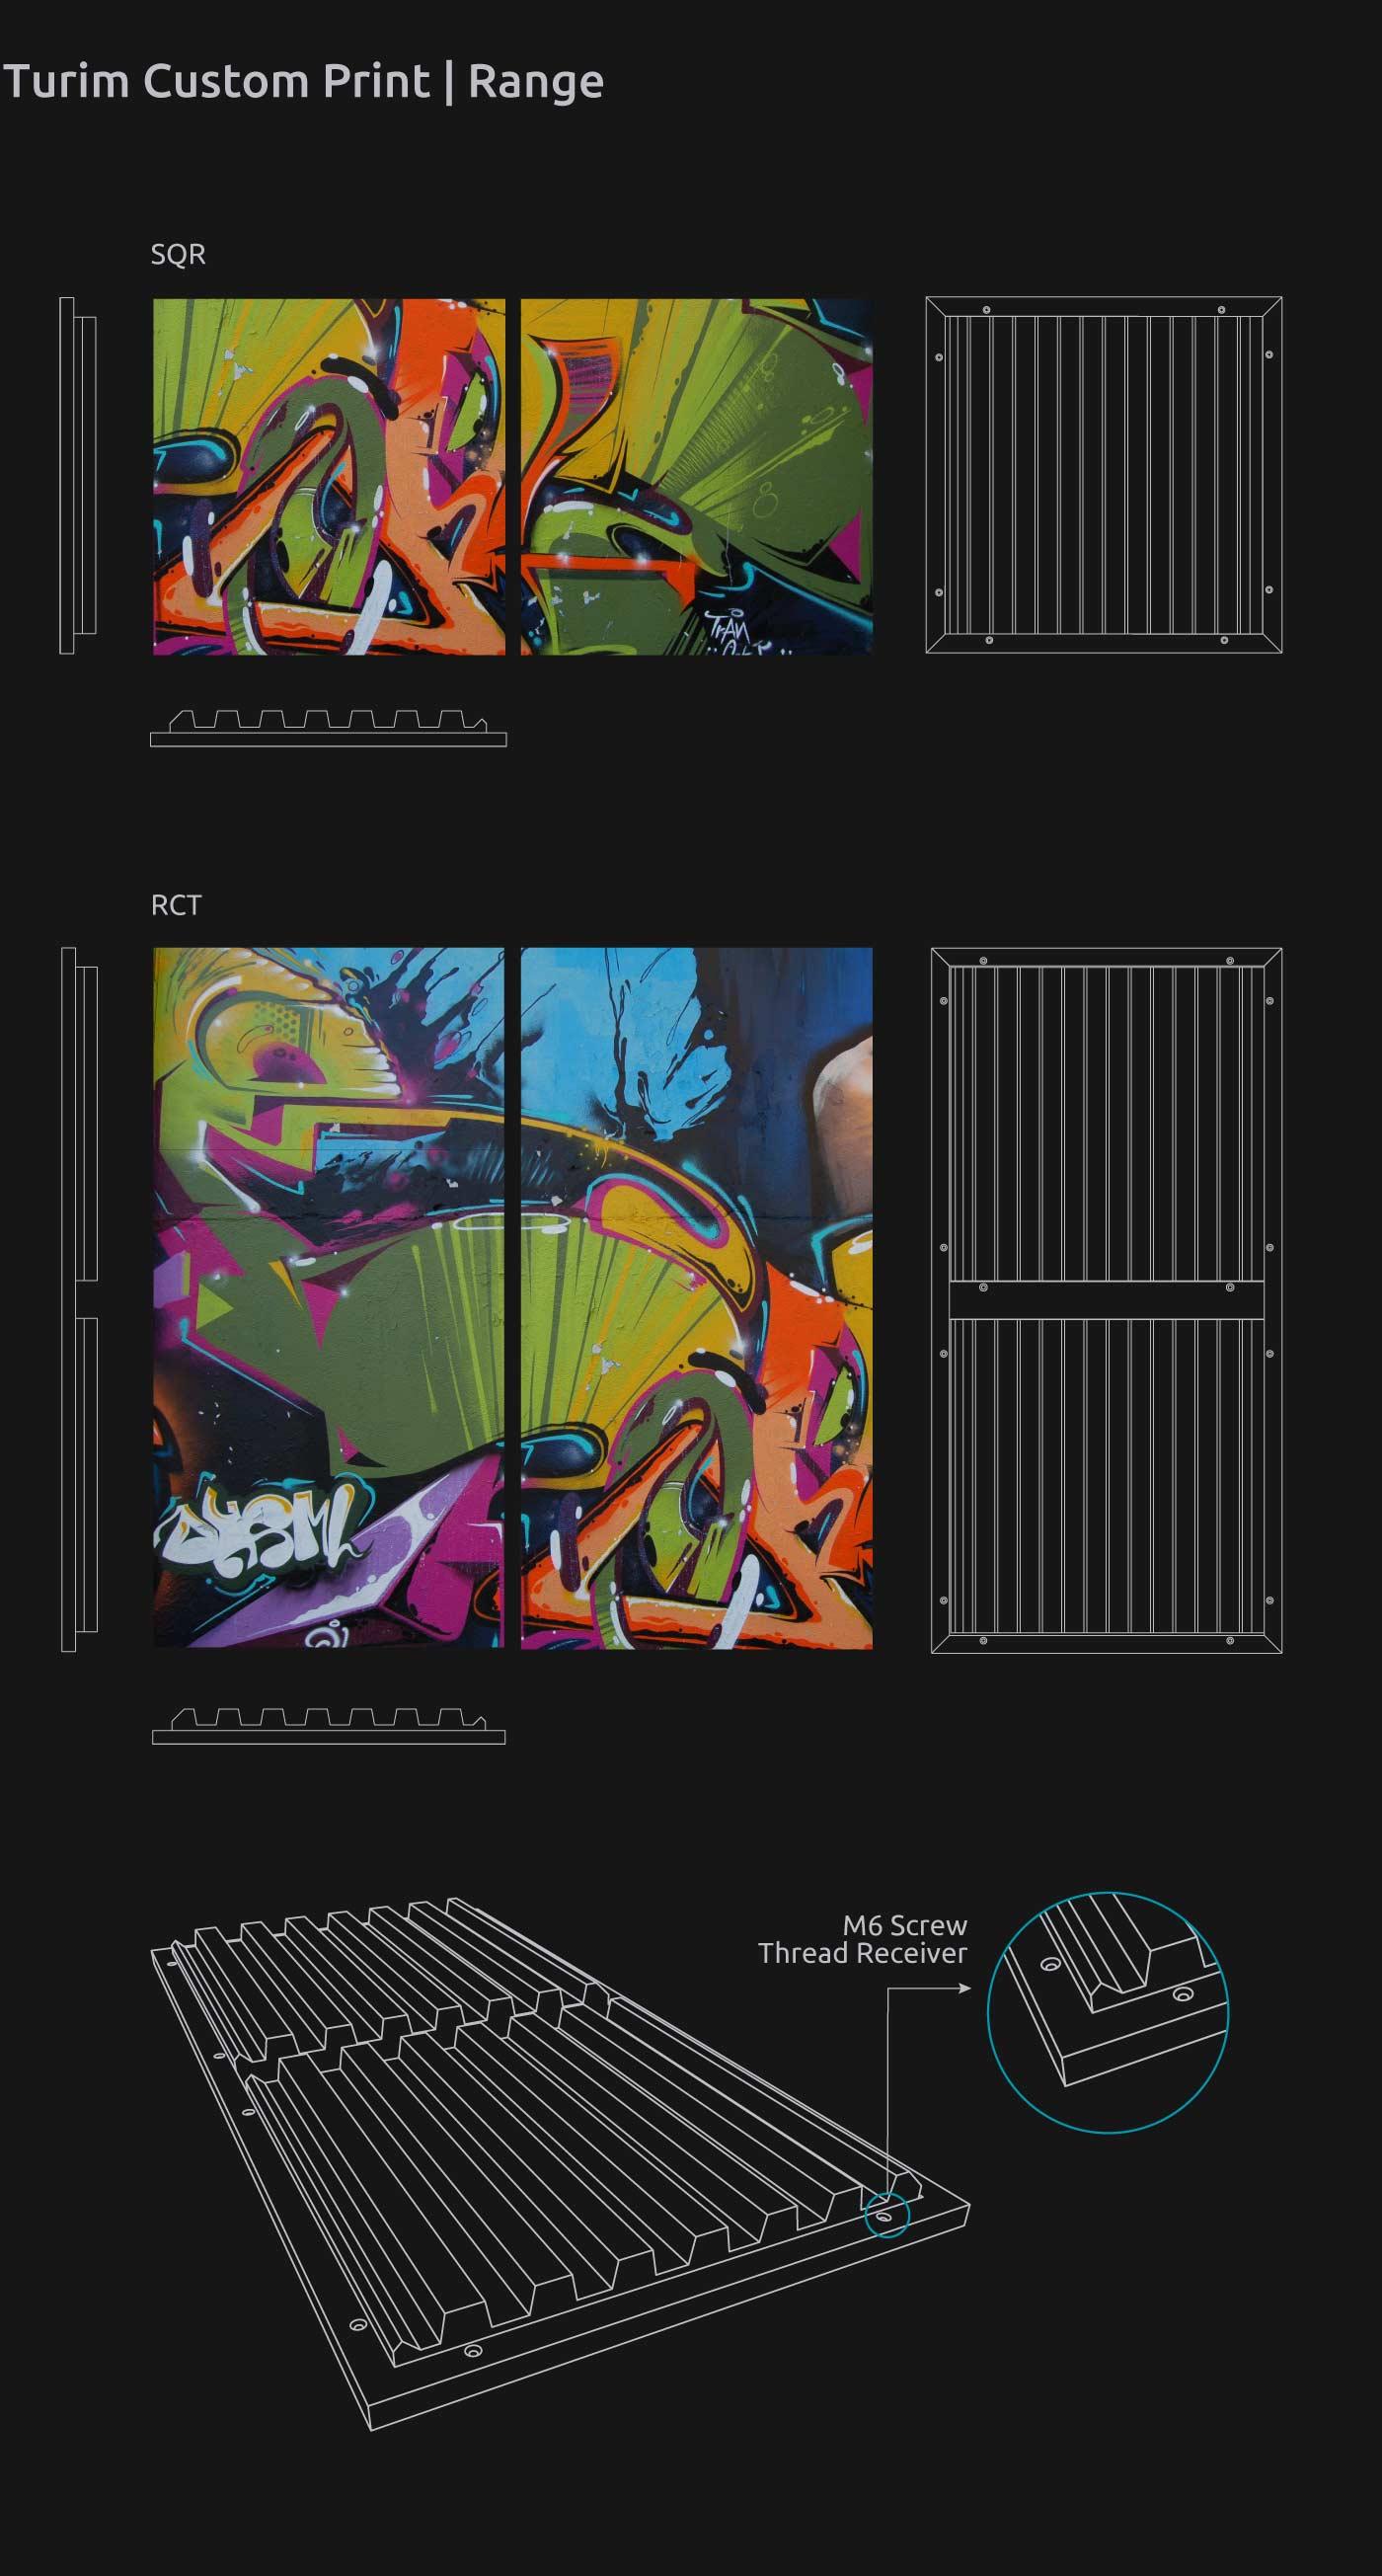 Artnovion product turim absorber custom print range f3f5adb4d9